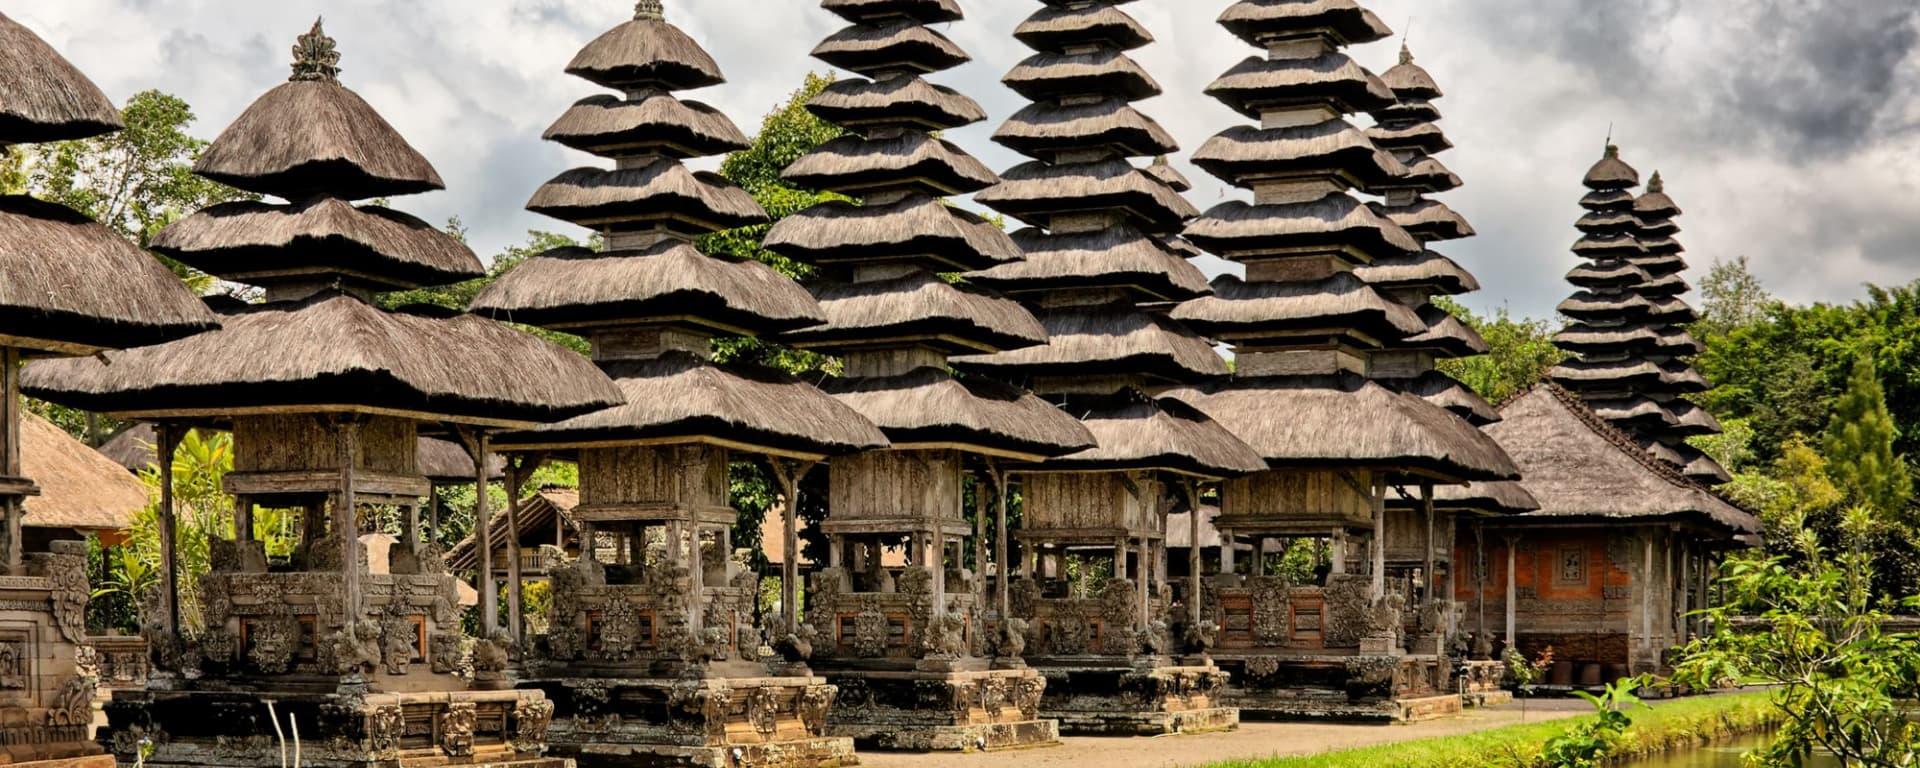 Transfert combiné avec des excursions Bali Sud – Bali Nord à Sud de Bali: Bali Taman Ayun Temple